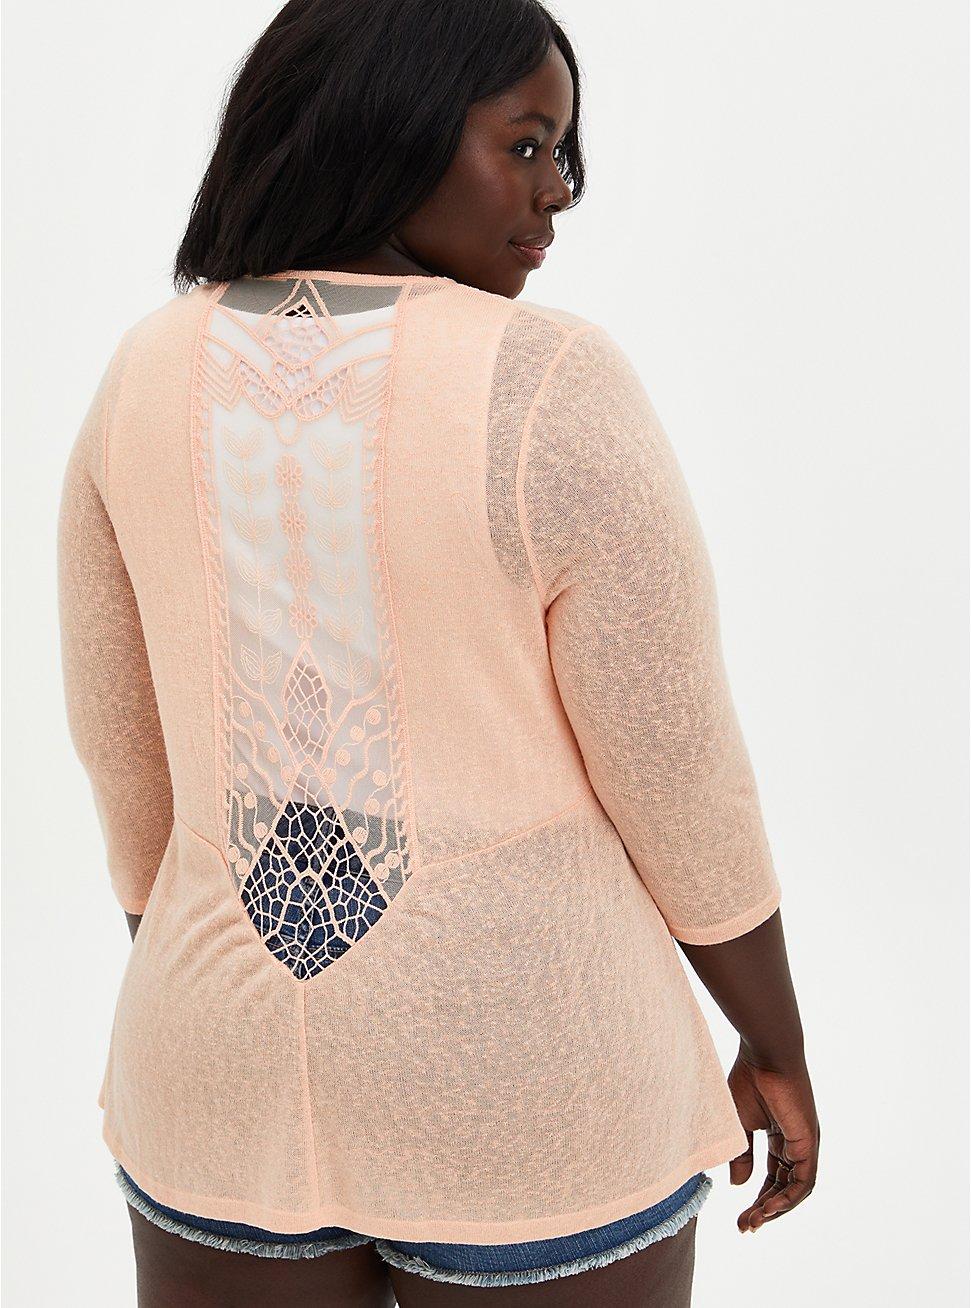 Plus Size Peach Lace Inset Handkerchief Cardigan Sweater, PEACH NECTAR, hi-res